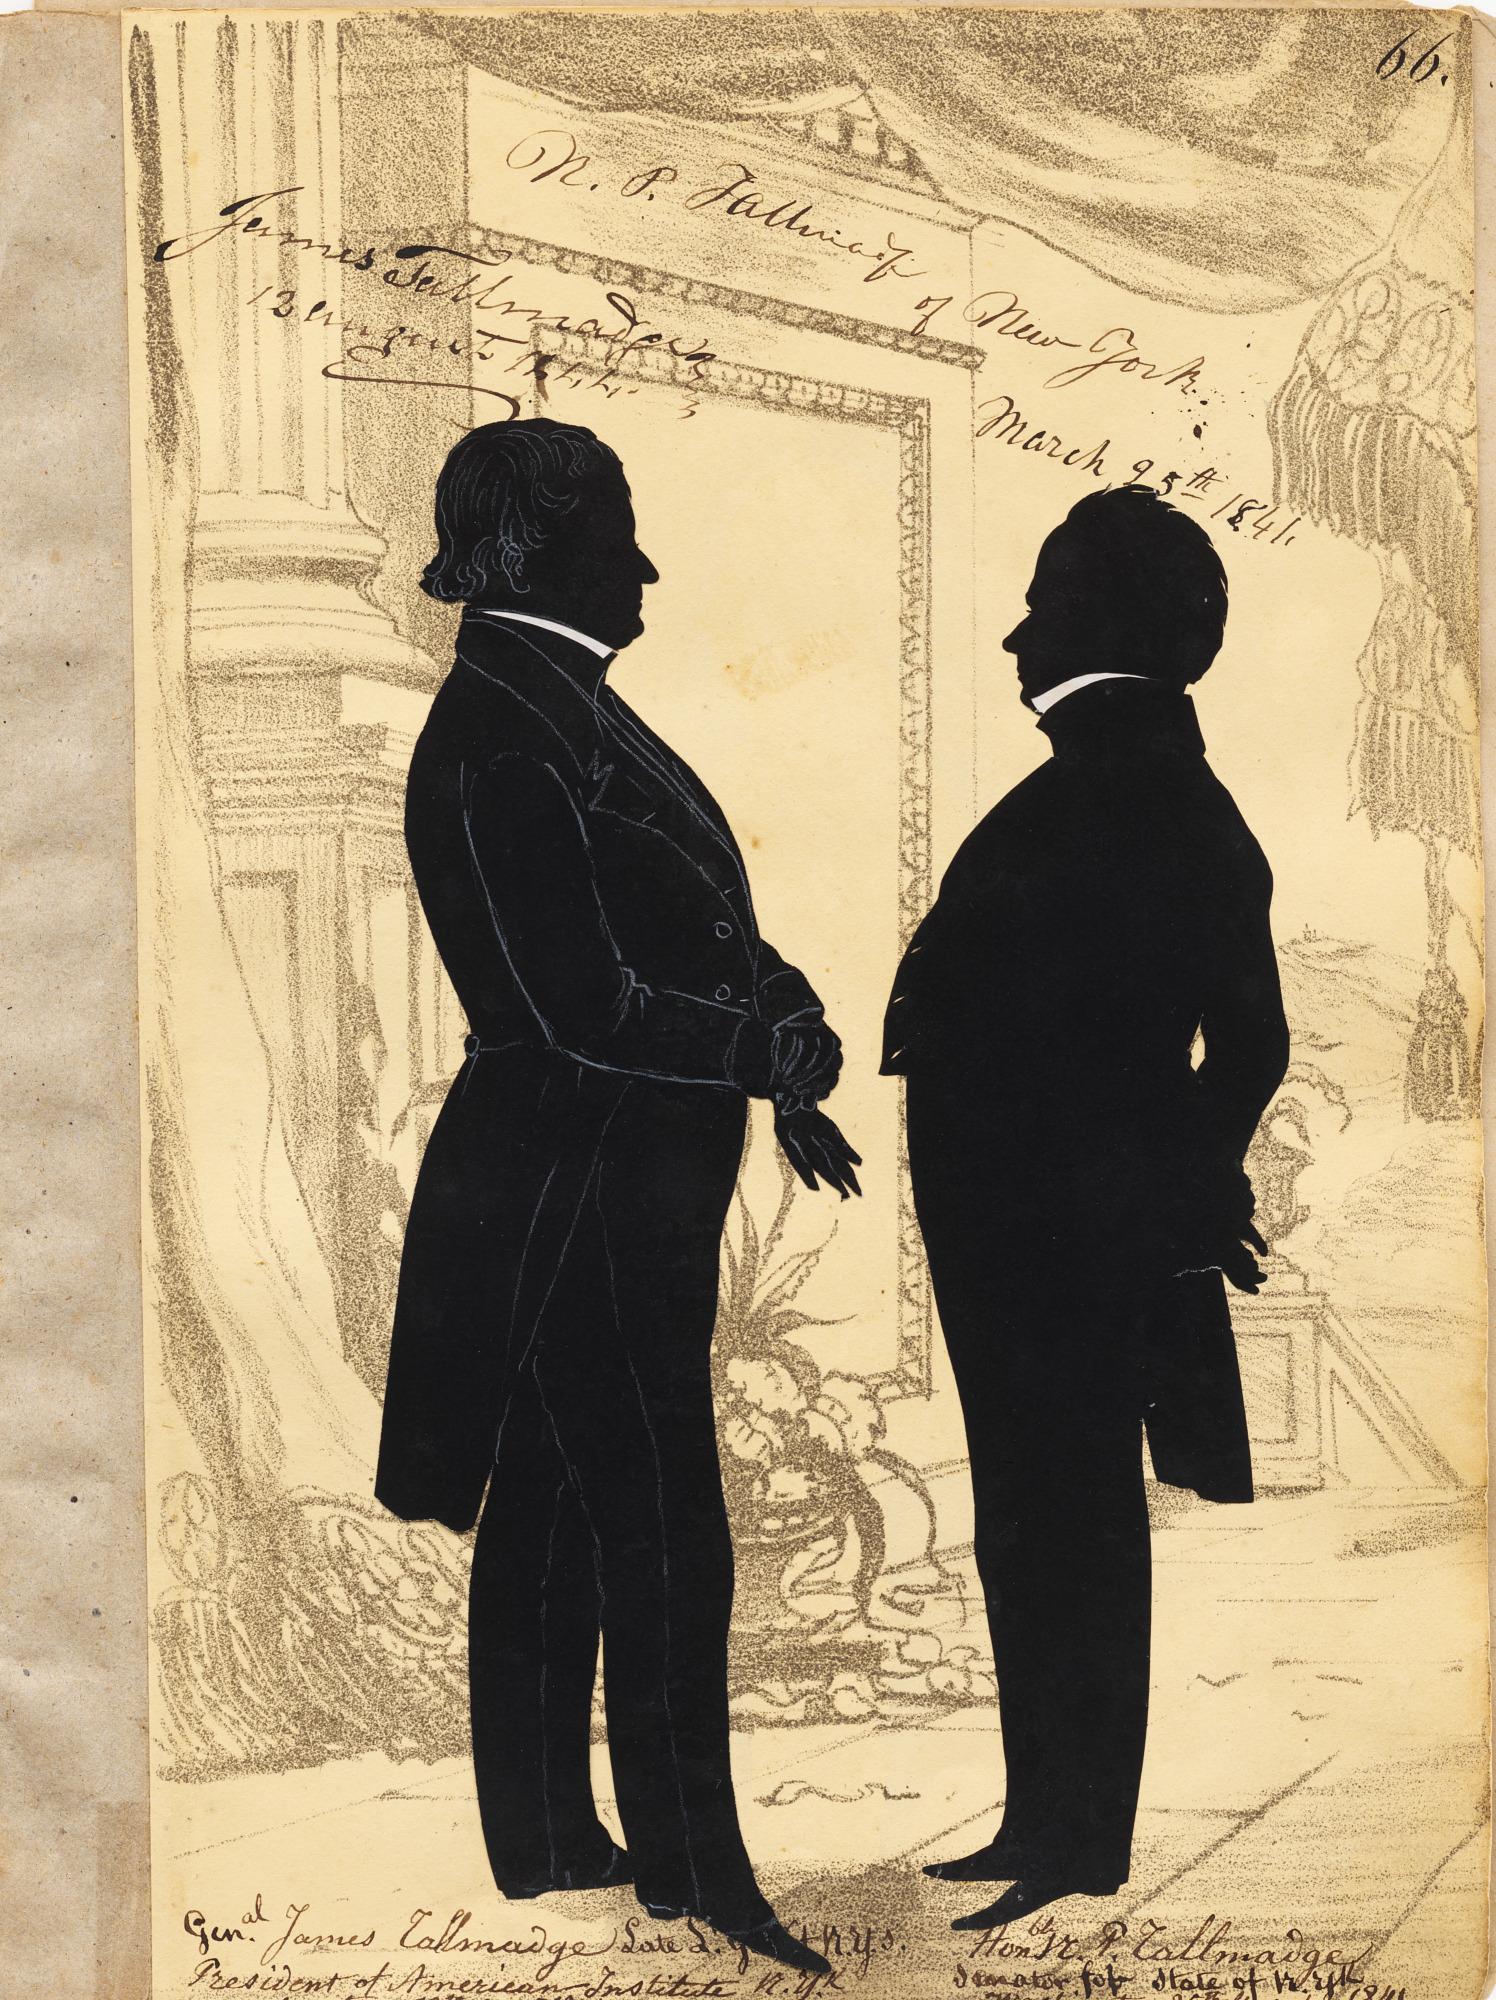 James Tallmadge and Nathaniel Tallmadge